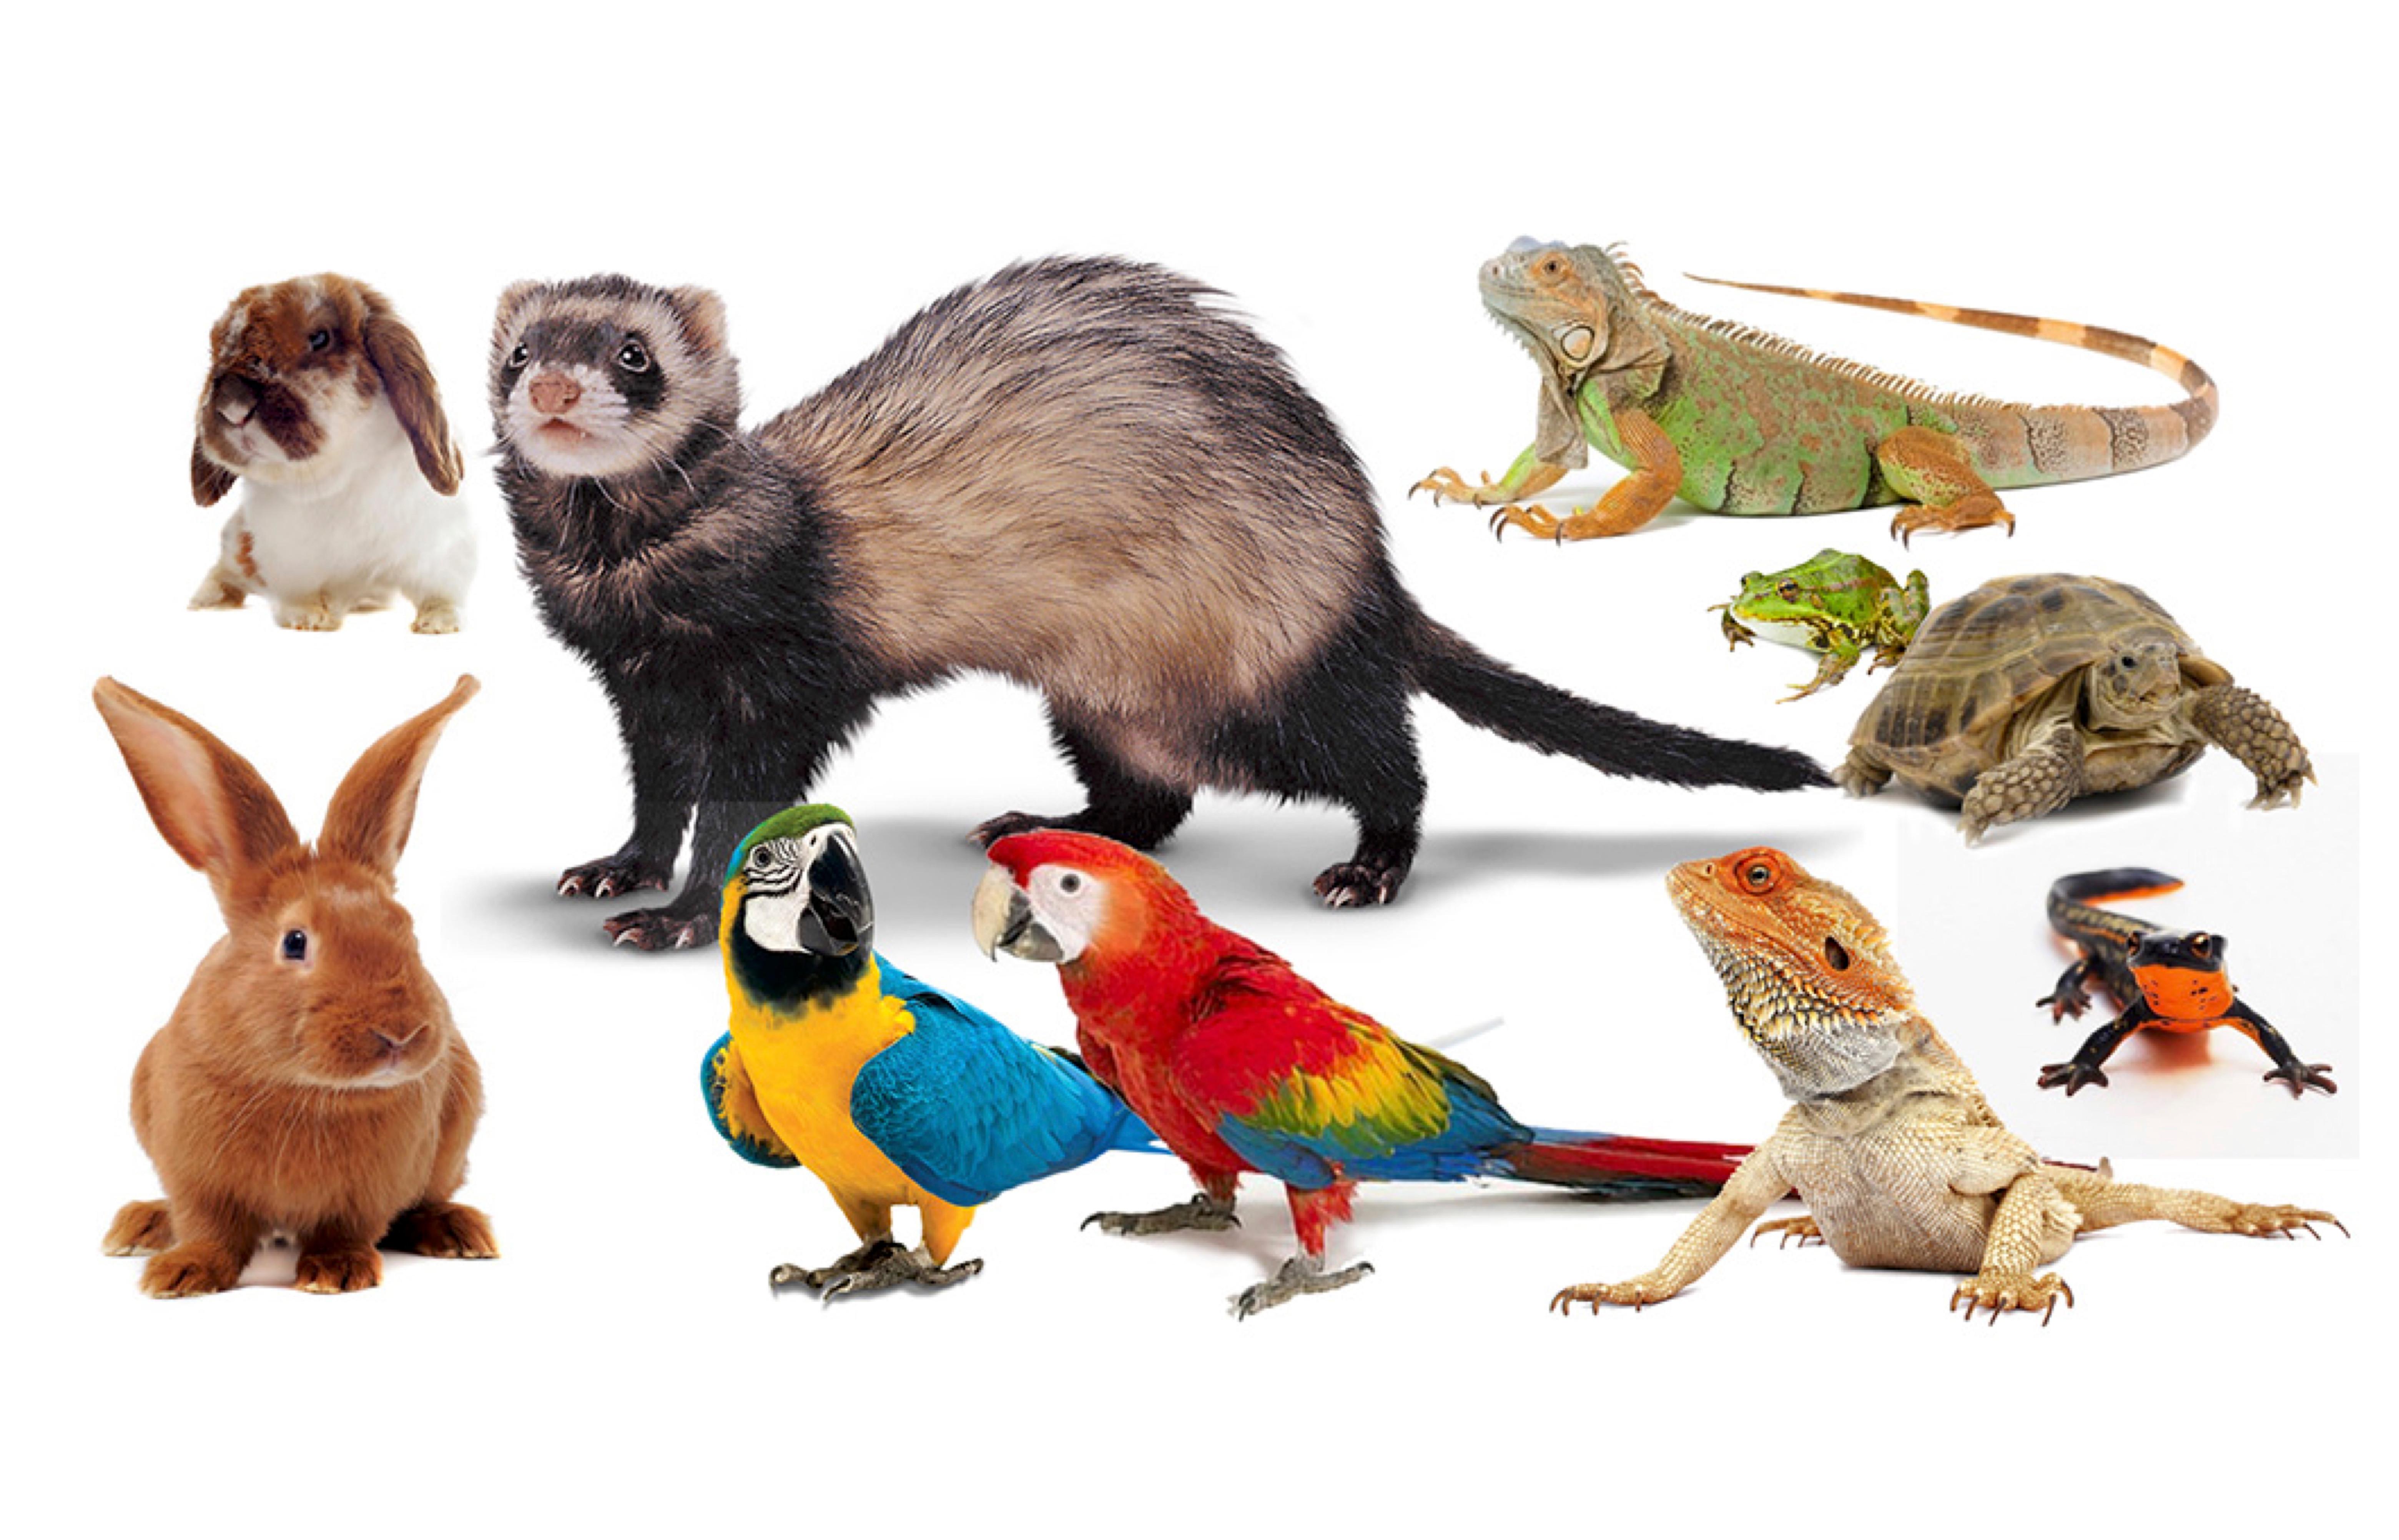 Consultas de Animales Exóticos